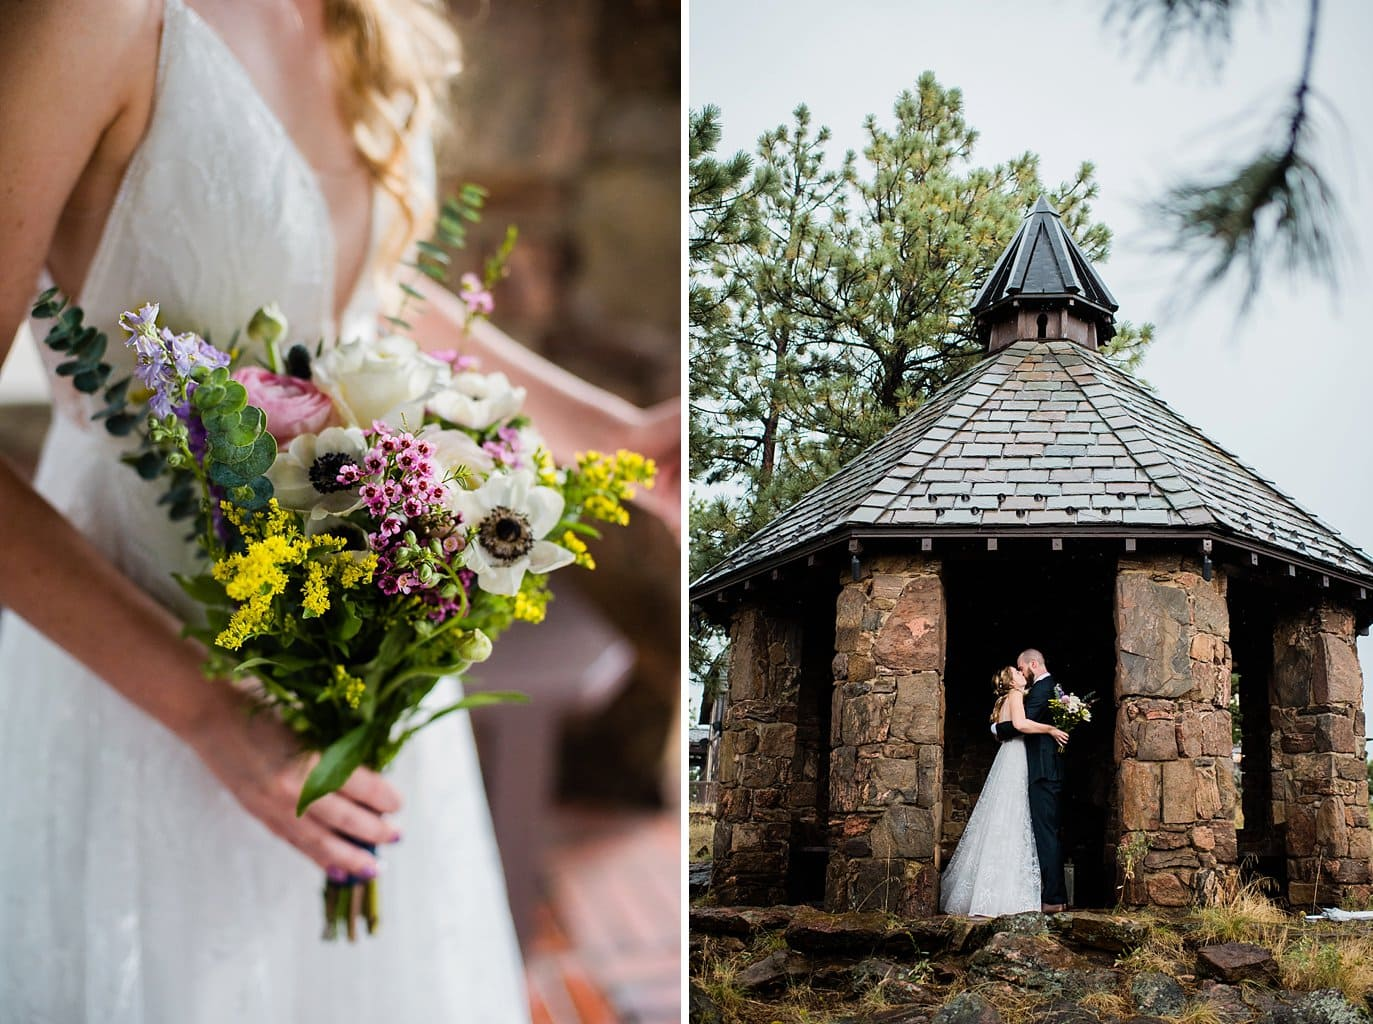 homemade wildflower bridal bouquet at colorado outdoor wedding